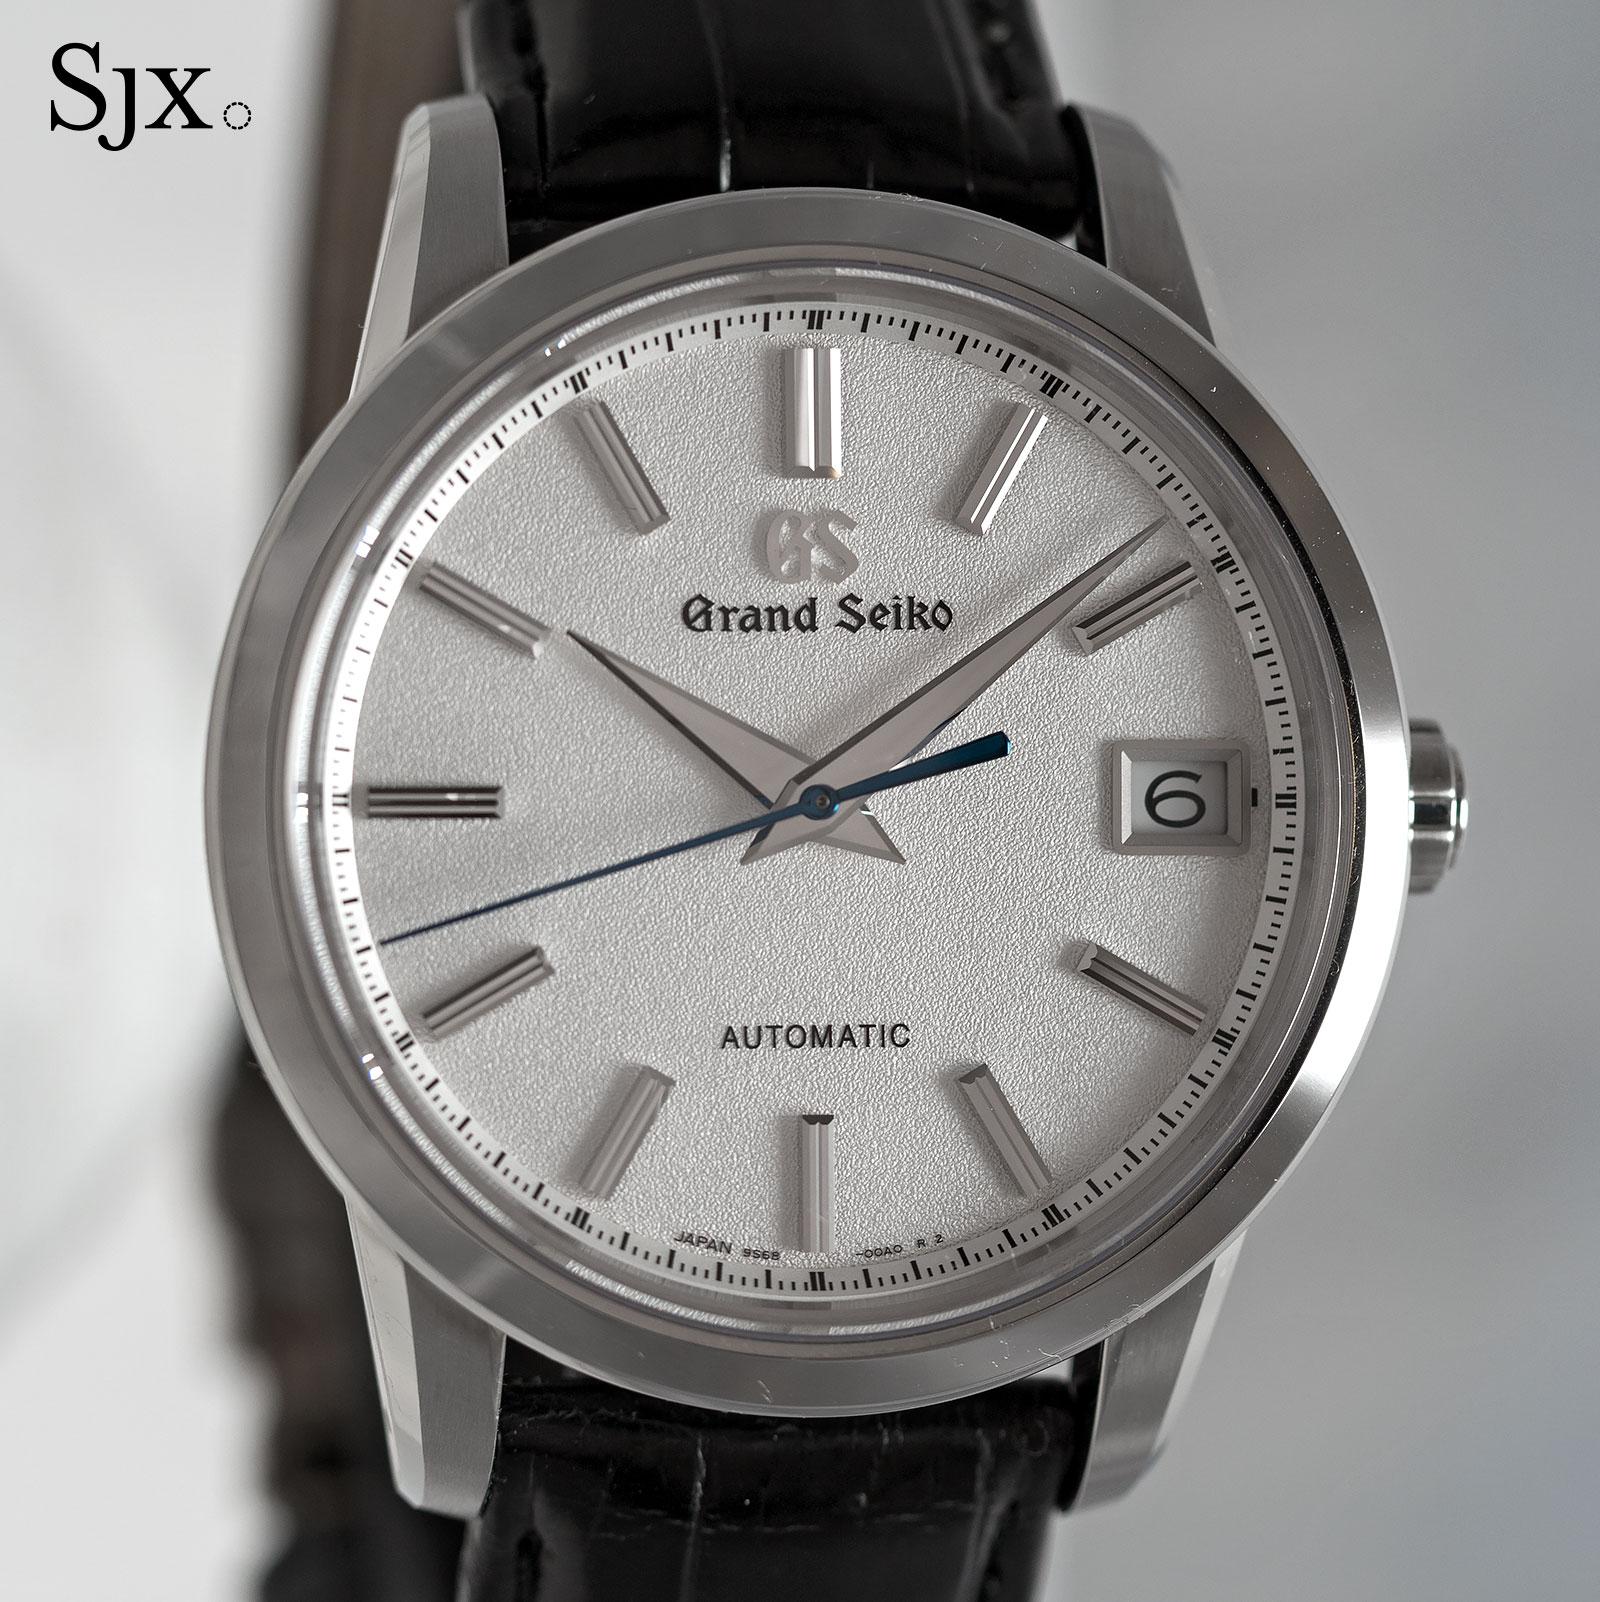 Grand Seiko SBGR305 titanium